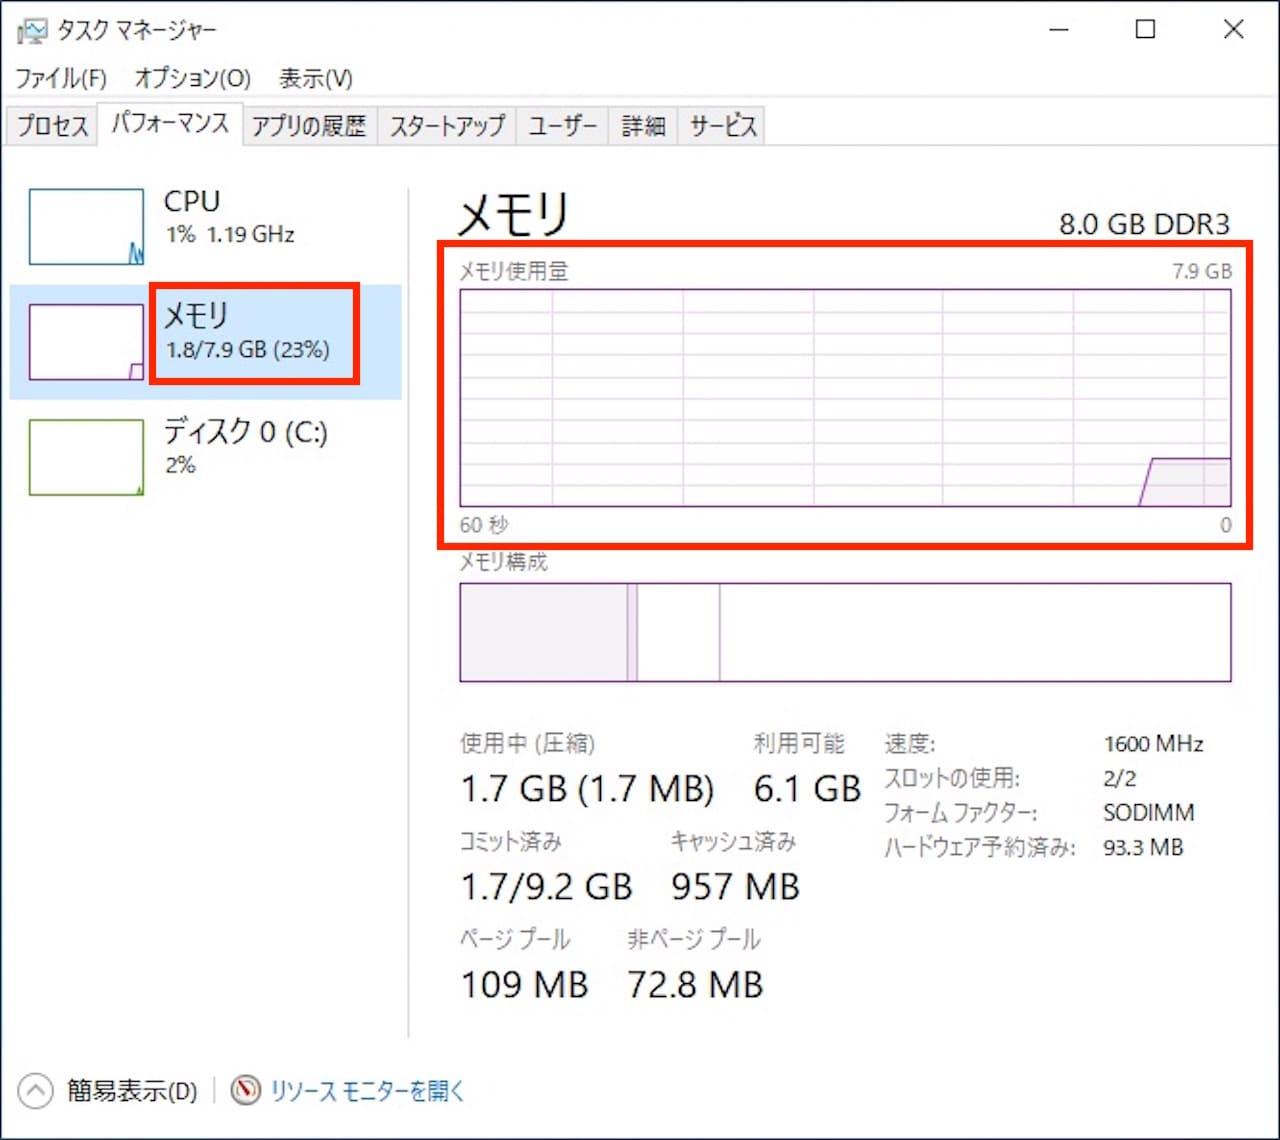 Windows10でメモリの使用状況を確認する方法